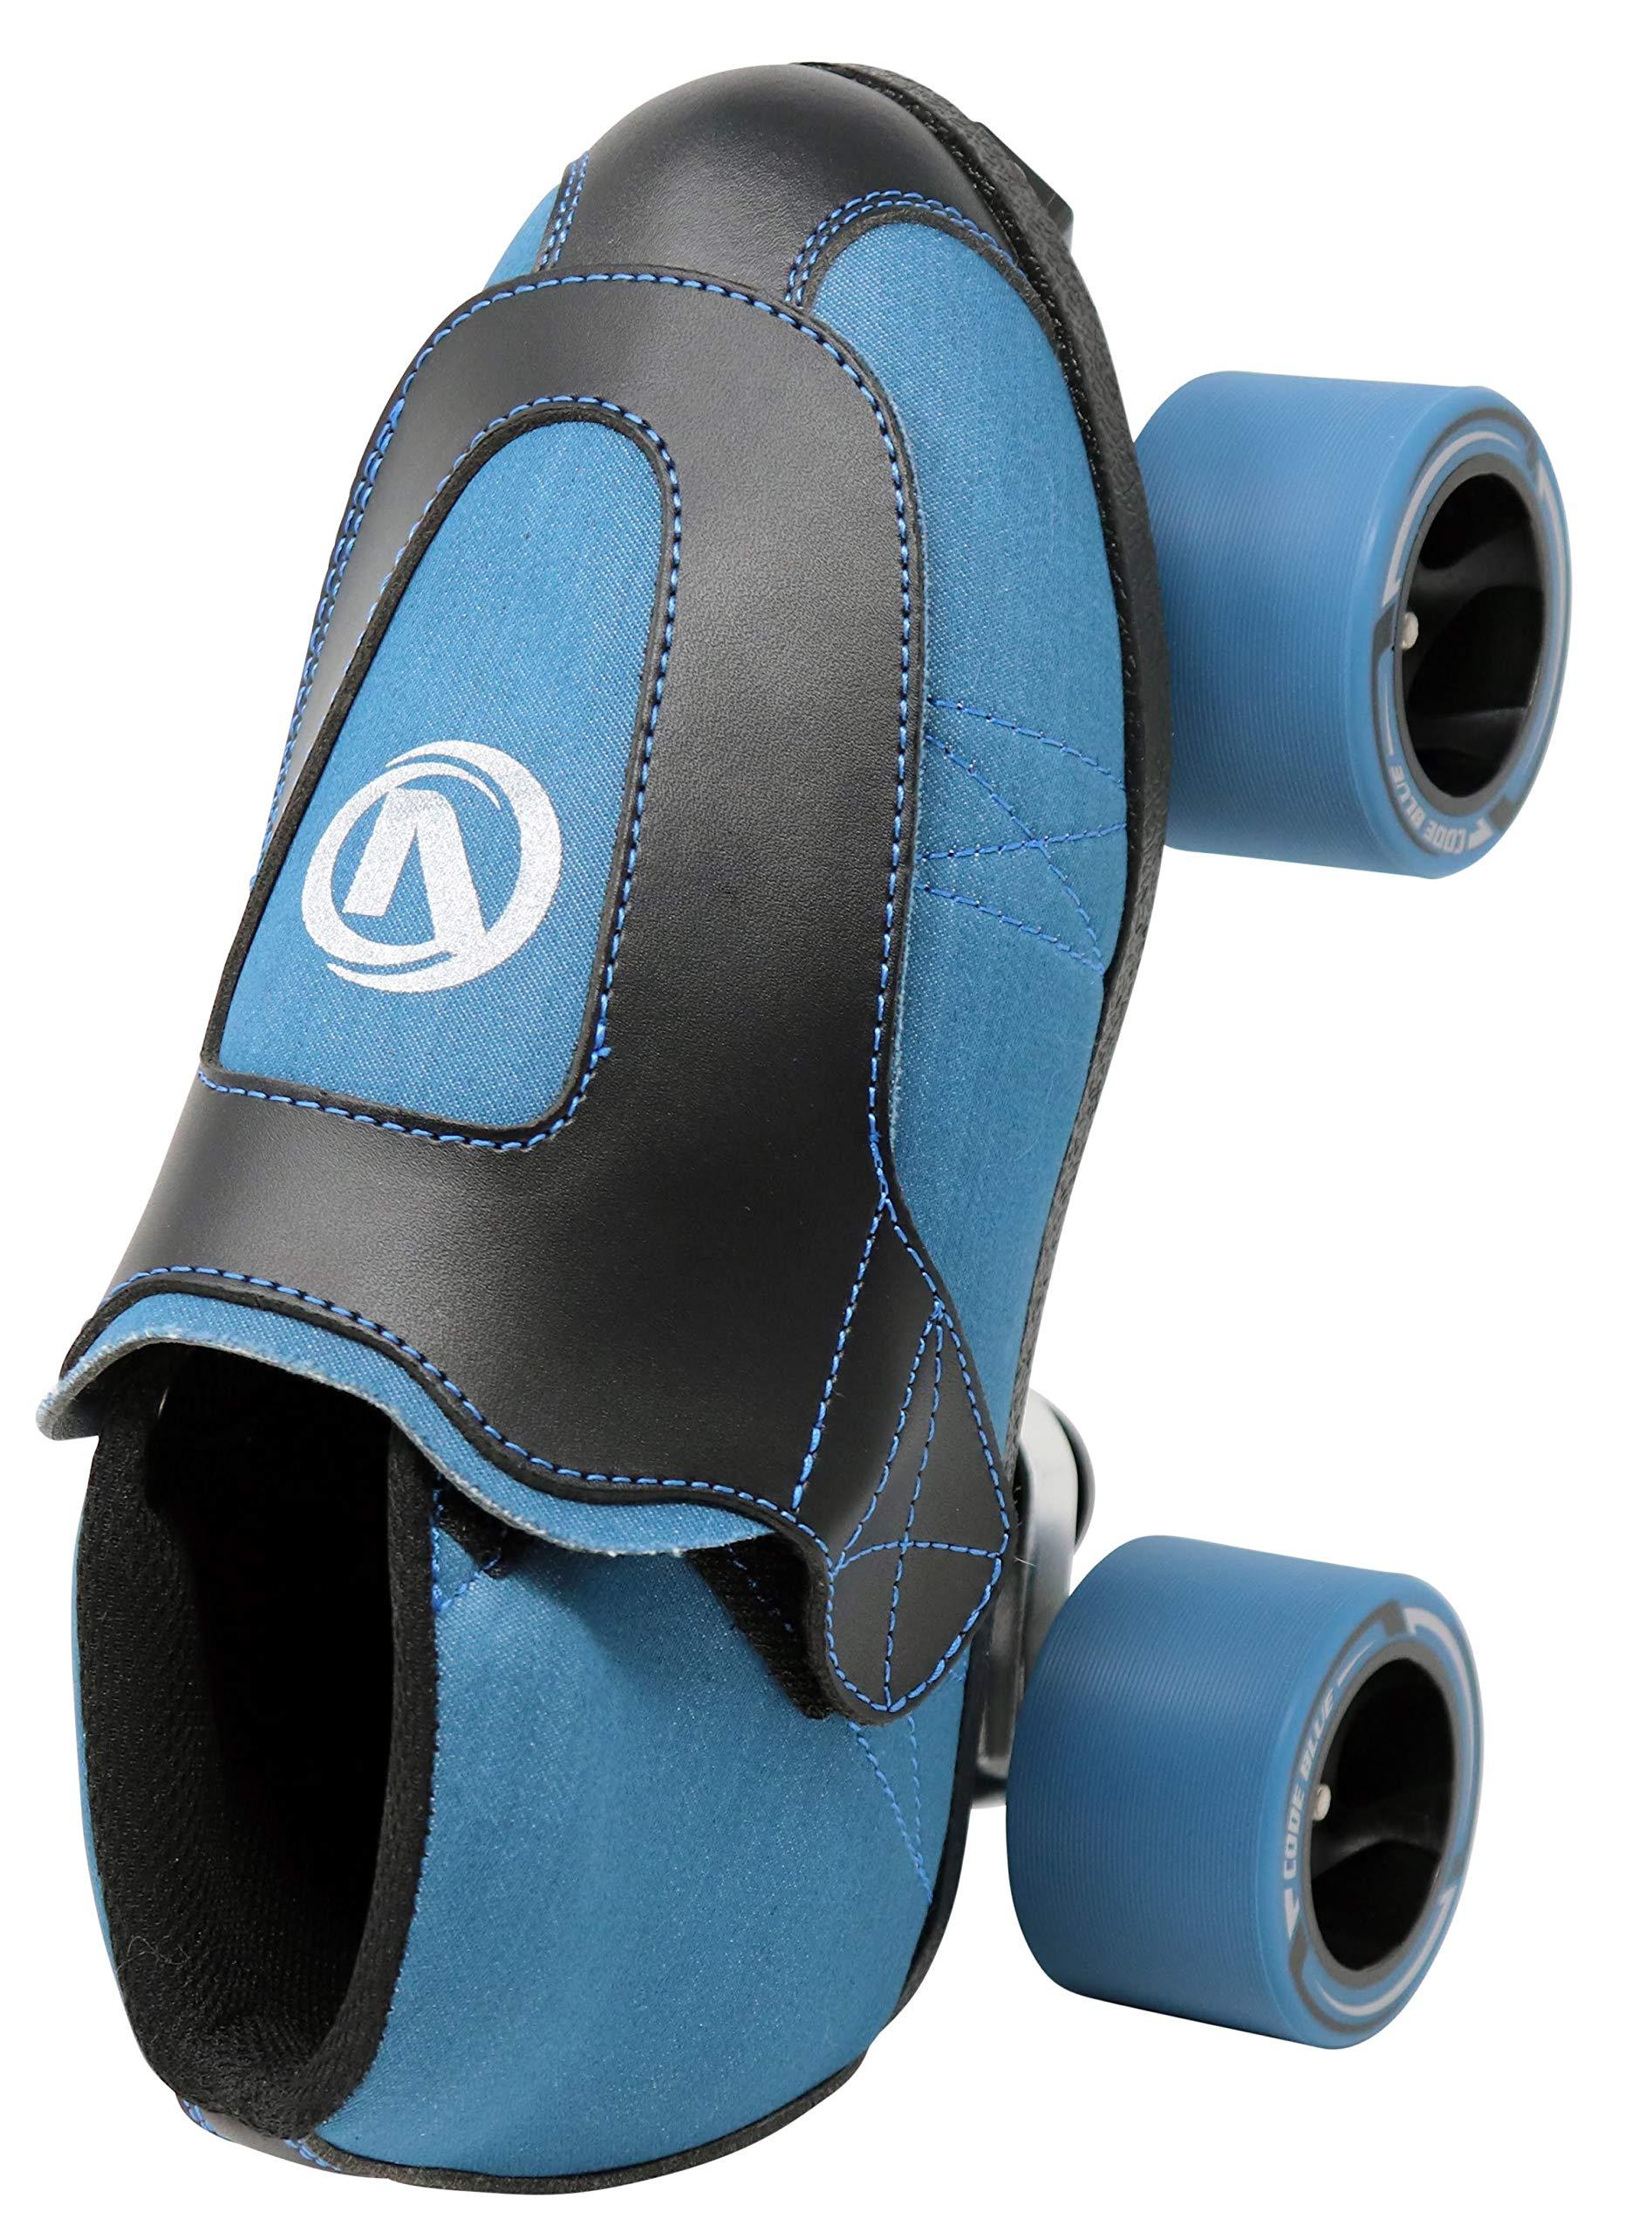 VNLA Code Blue Jam Skate - Mens & Womens Speed Skates - Quad Skates for Women & Men - Adjustable Roller Skate/Rollerskates - Outdoor & Indoor Adult Quad Skate - Kid/Kids Roller Skates (Size 4) by VNLA (Image #4)